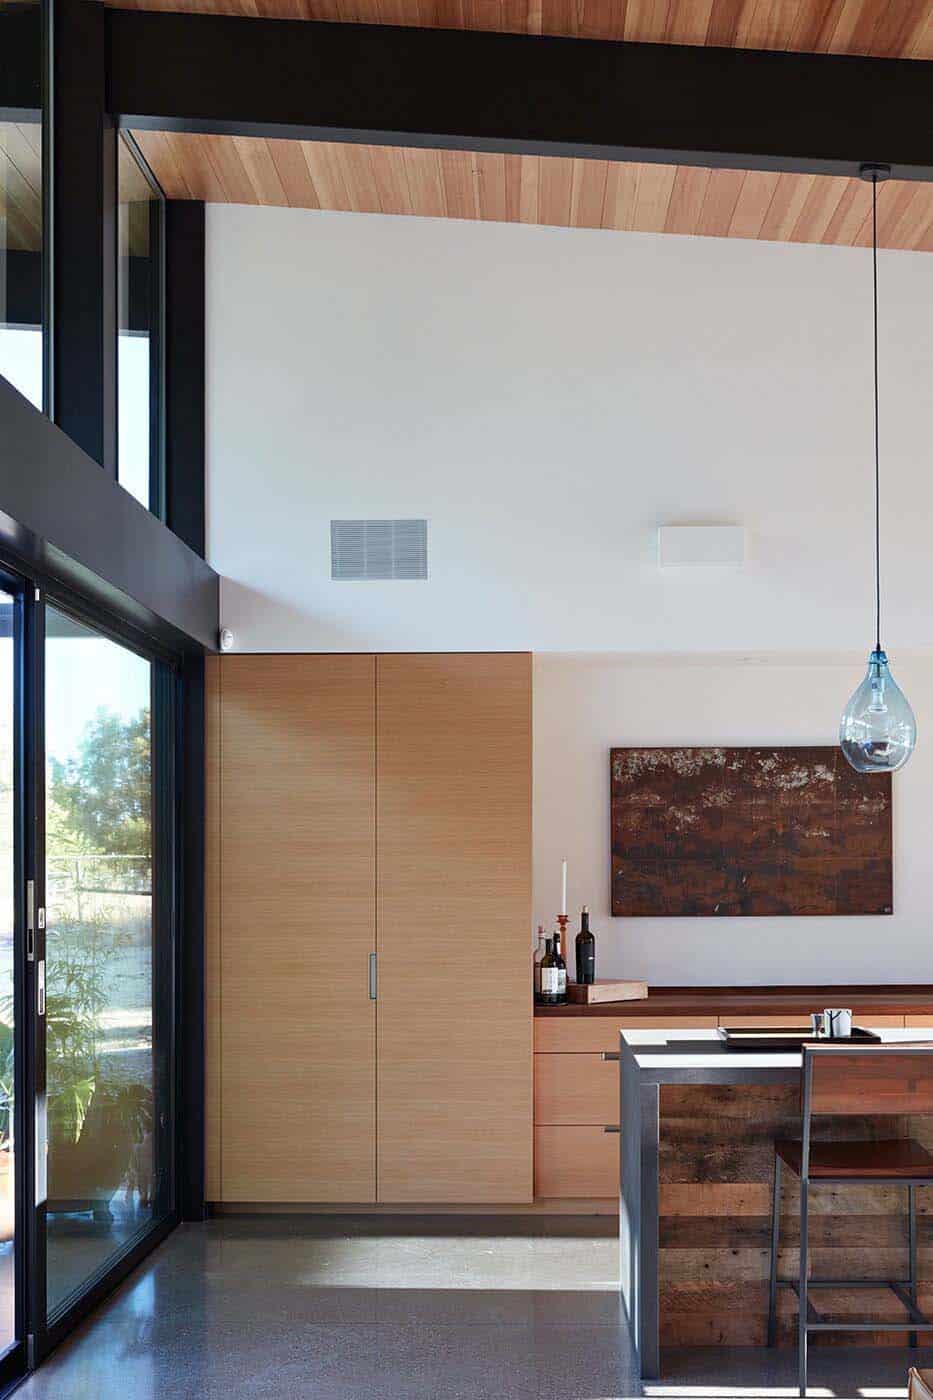 Sacramento Modern Residence-Klopf Architecture-11-1 Kindesign